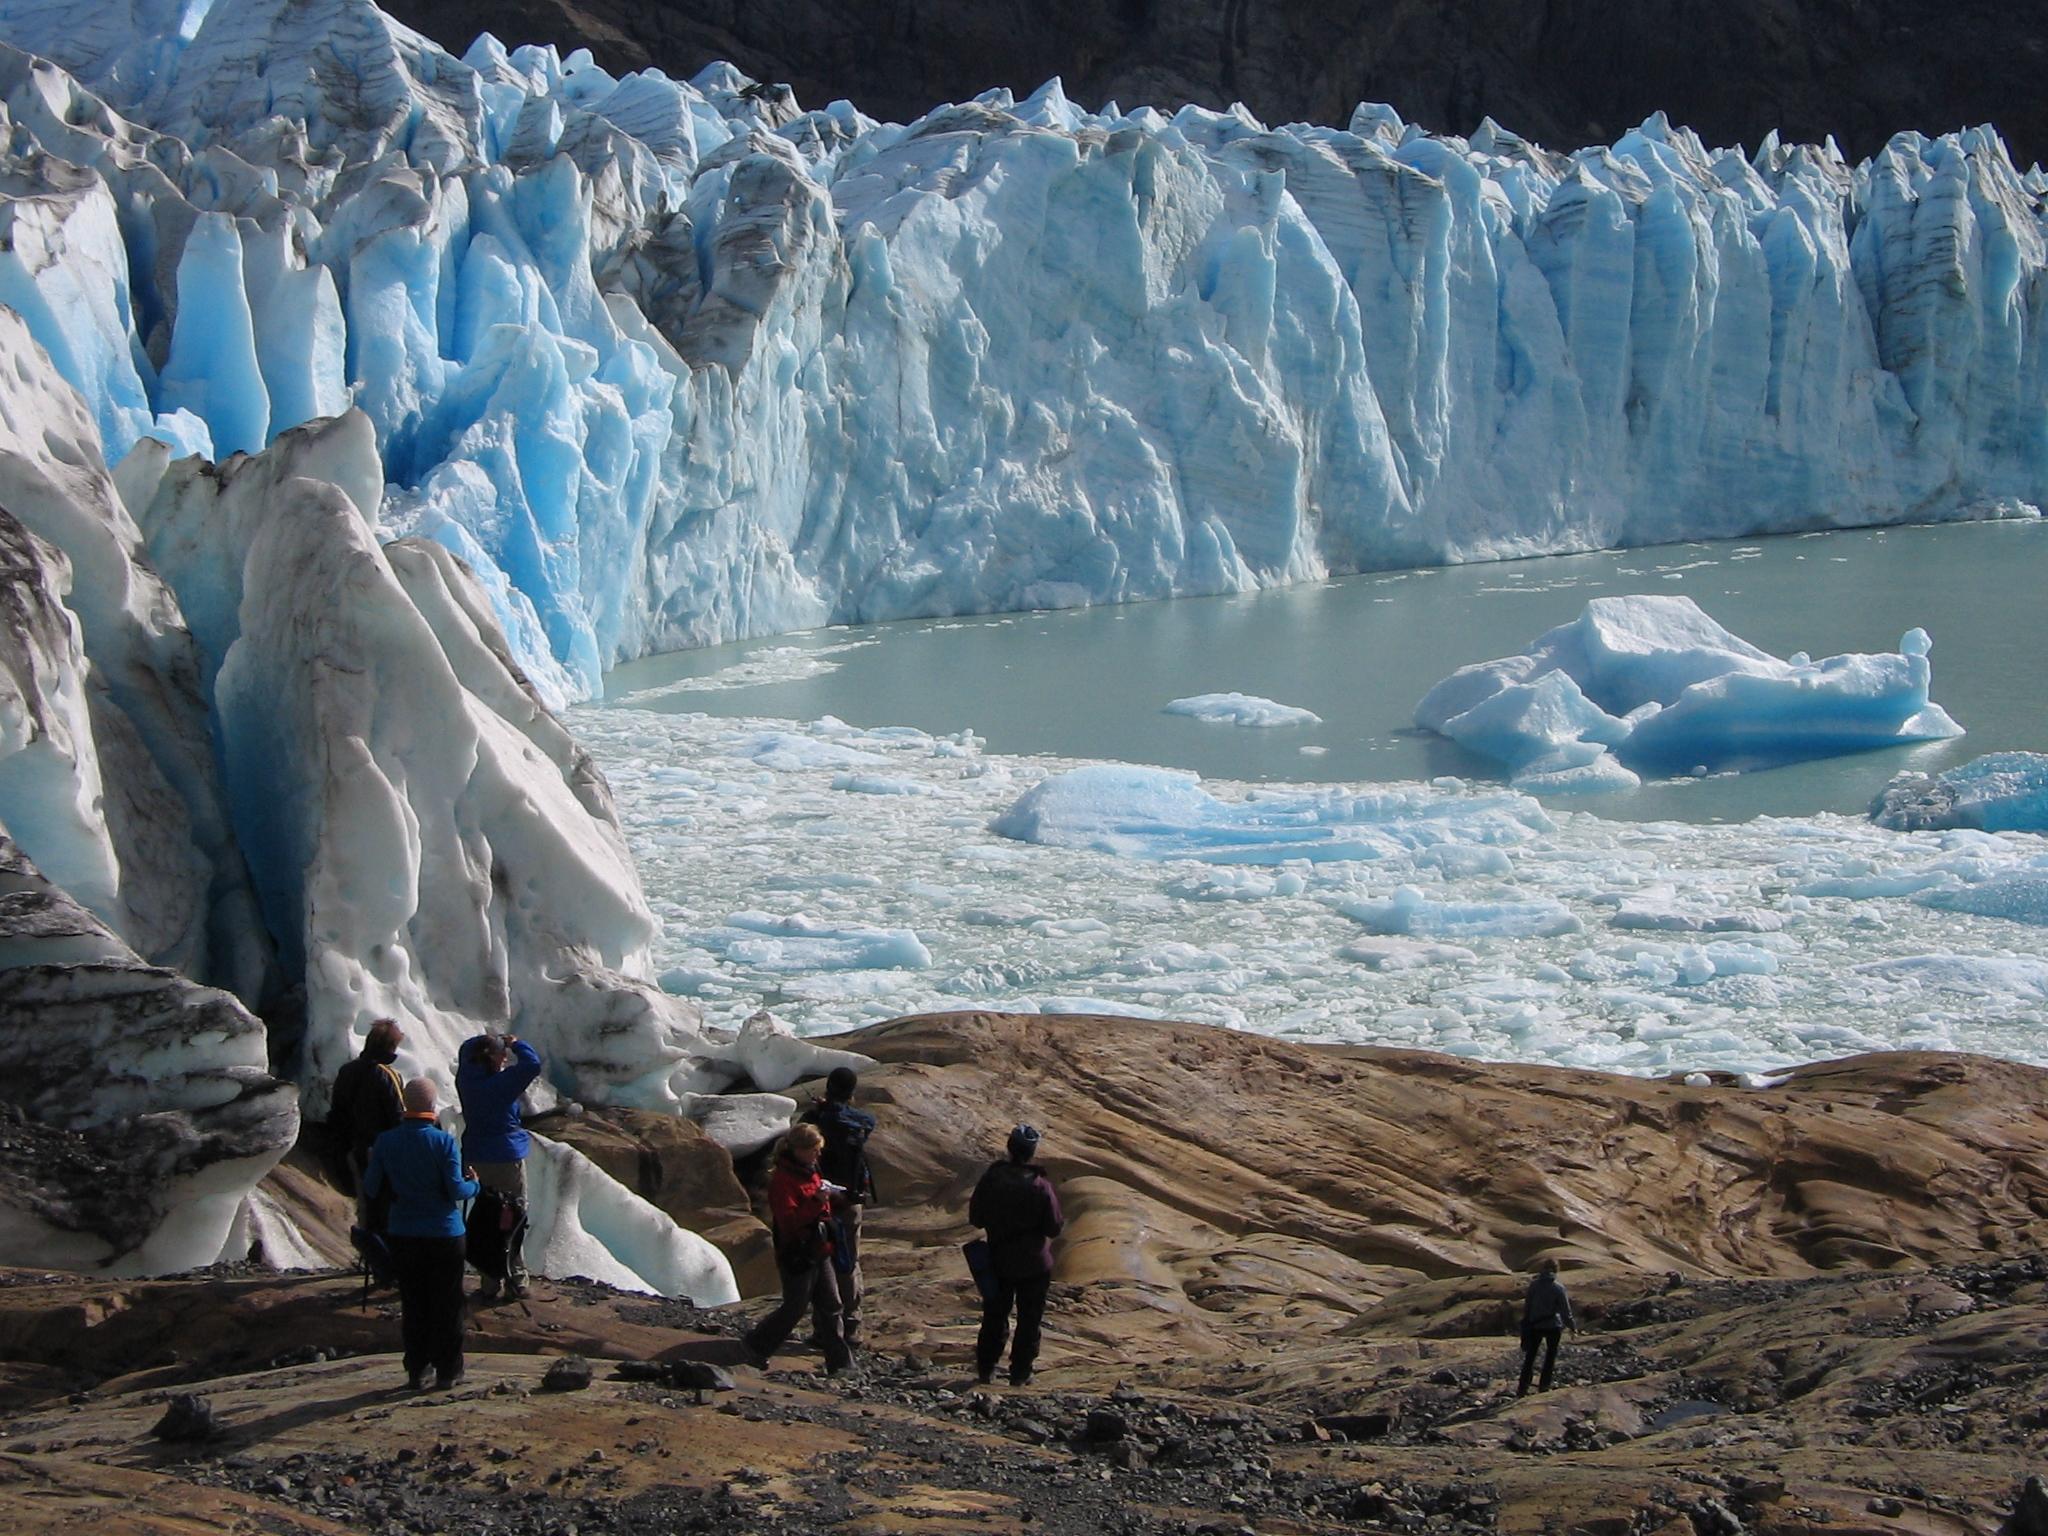 viedma-glacier-photo-by-d-semper-32